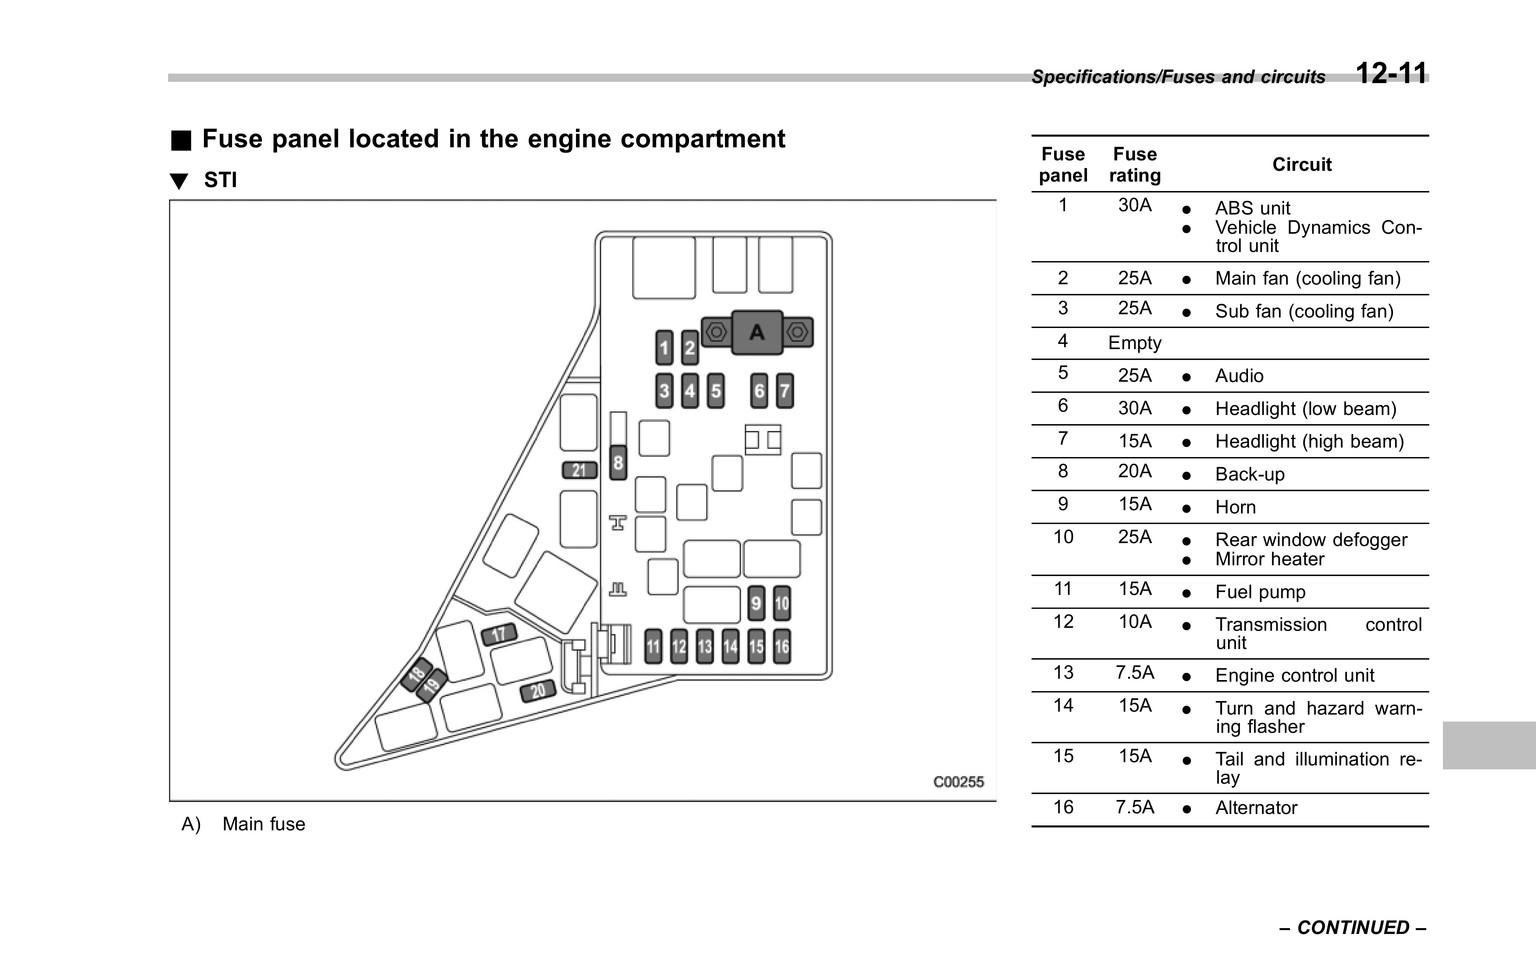 EZ_9600] 1996 Subaru Impreza Wrx Under The Dash Fuse Box Diagram Wiring  DiagramNorab Istic Xortanet Capem Mohammedshrine Librar Wiring 101